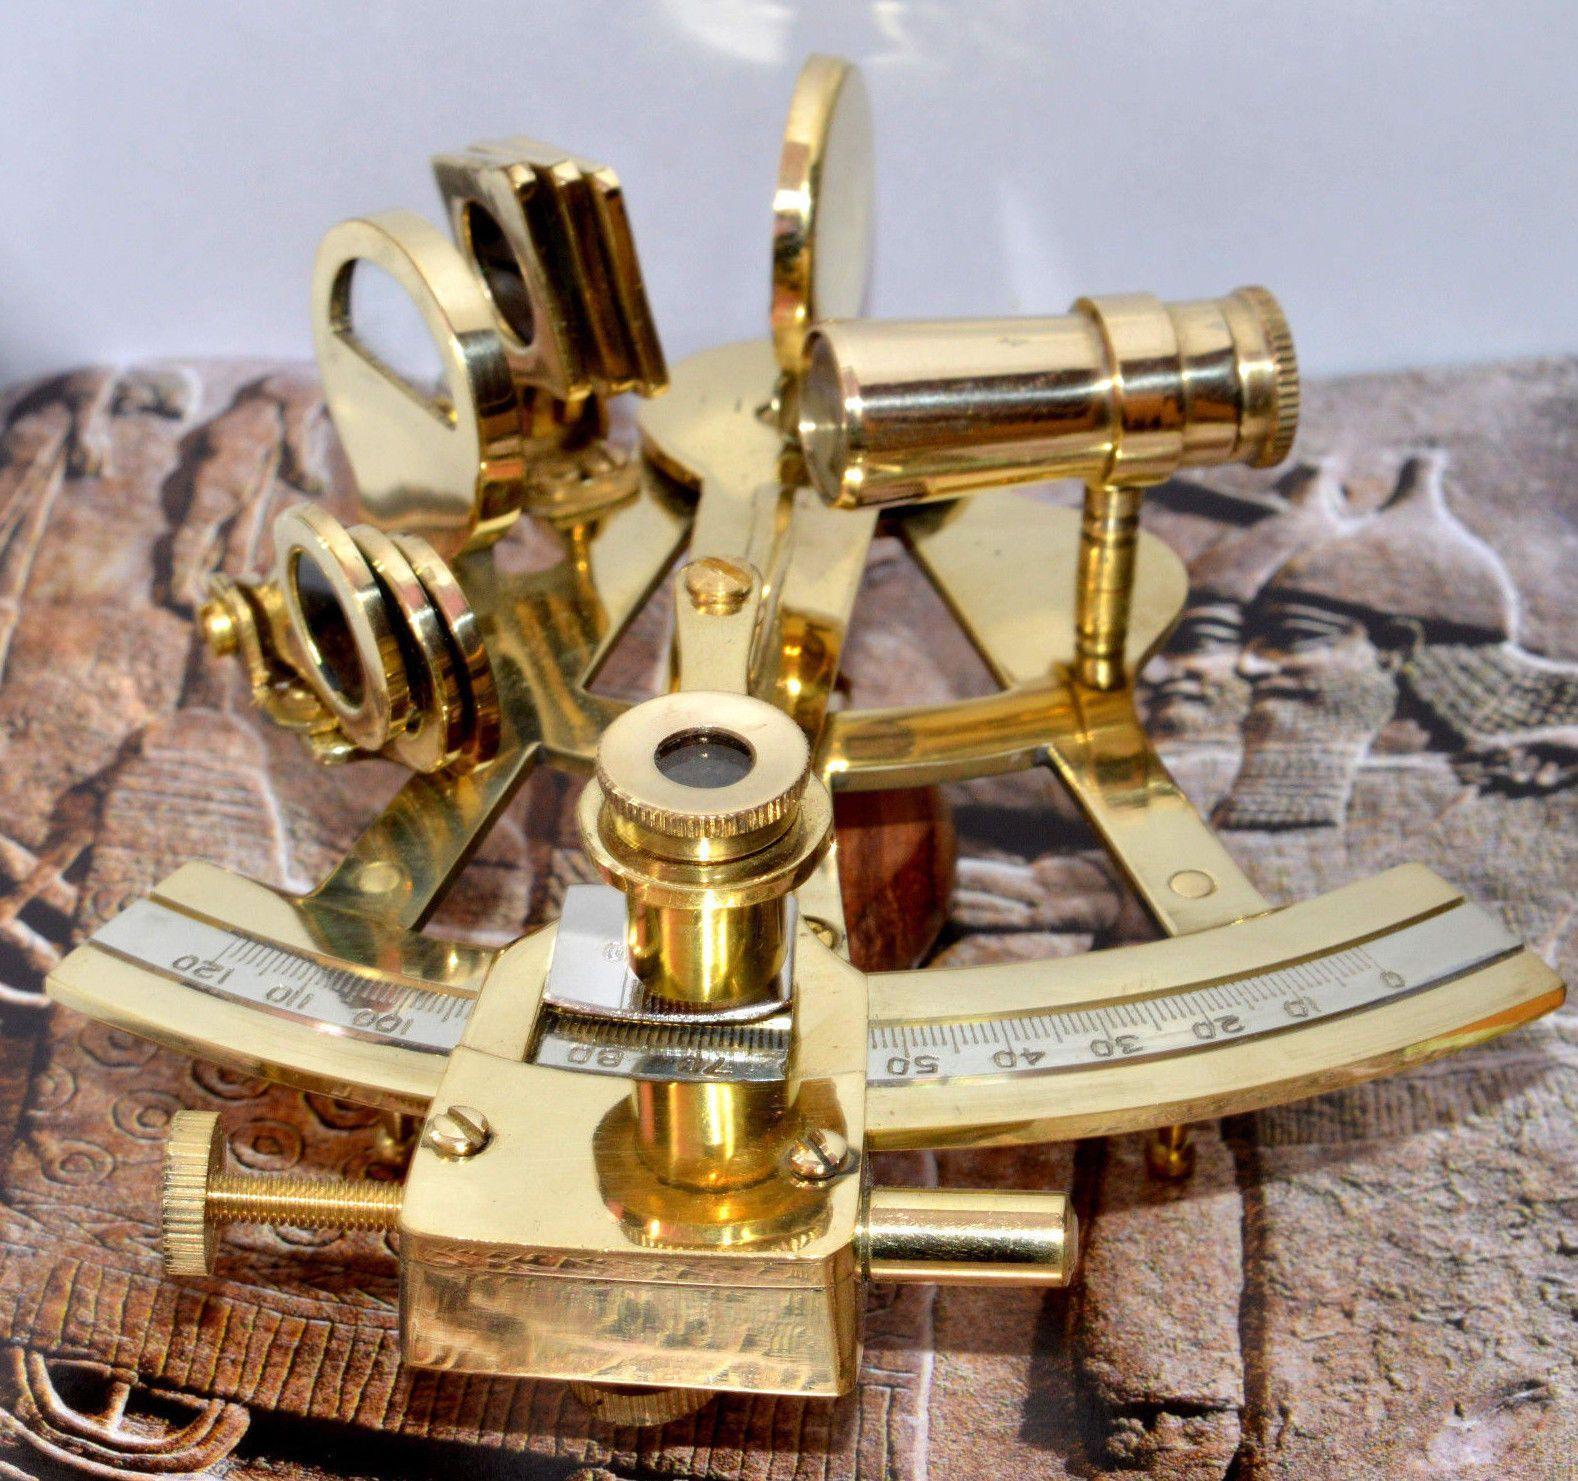 Maritime Brass Sextant Marine Design Navigation Vintage Astrolabe Nautical Sextant Decor Maritime Navigational Instruments